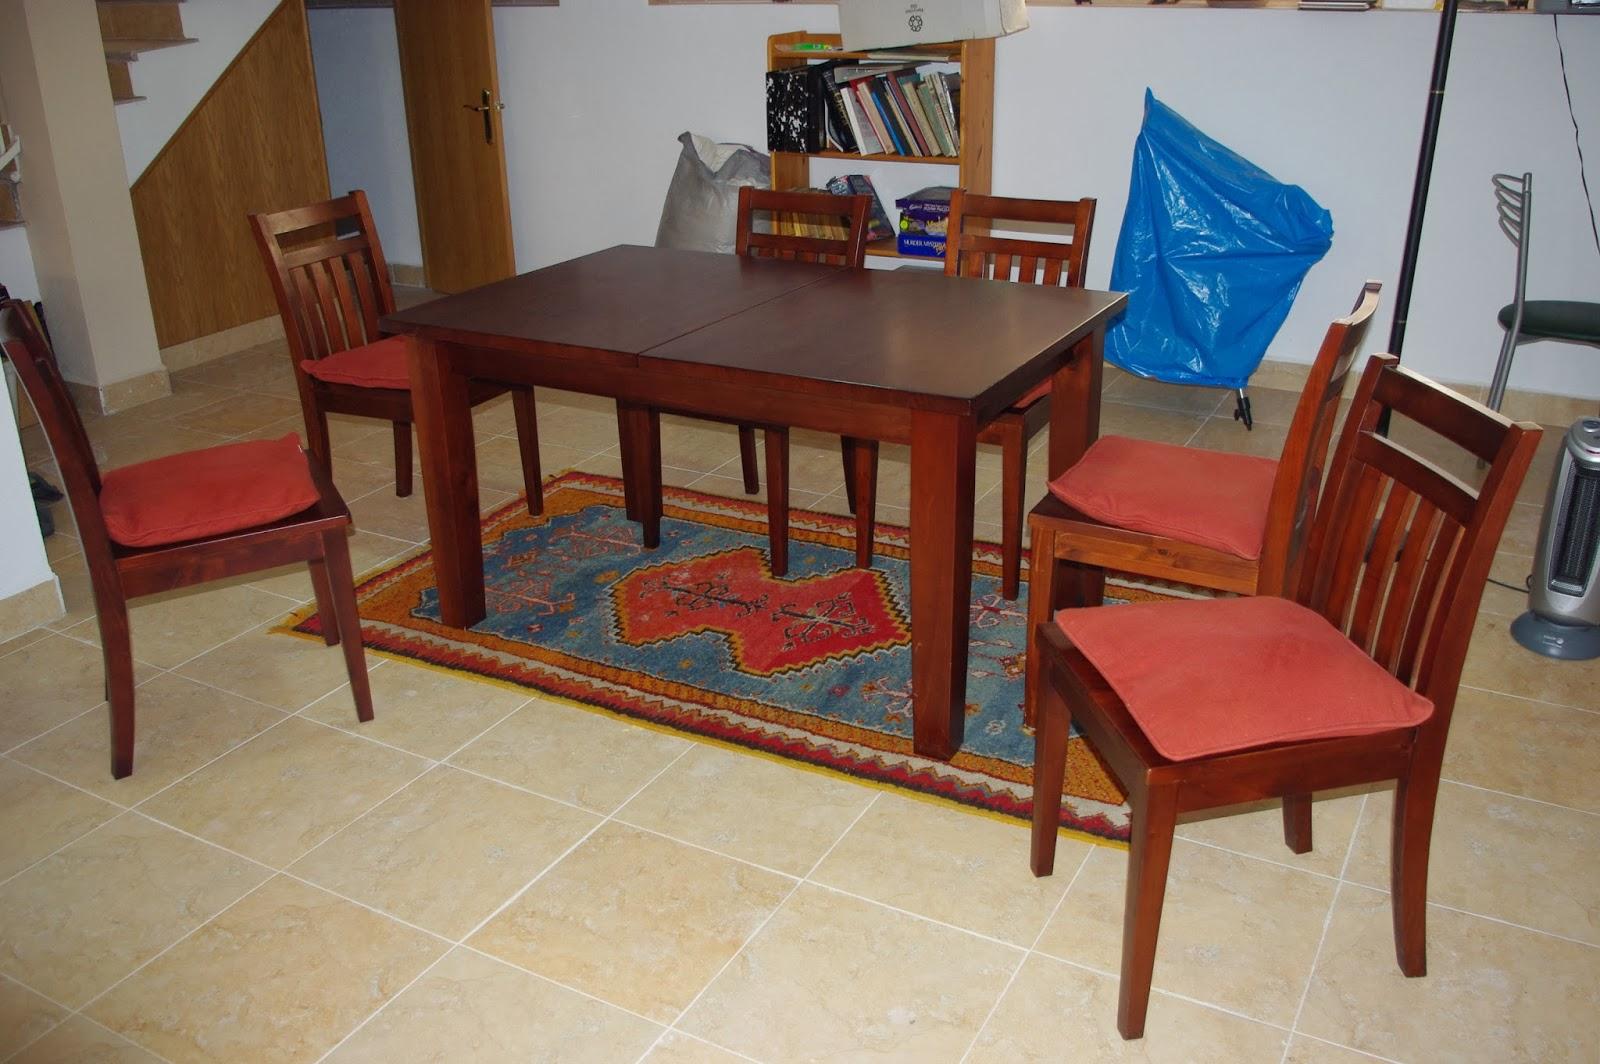 Digame for sale furniture - Sofas velez malaga ...